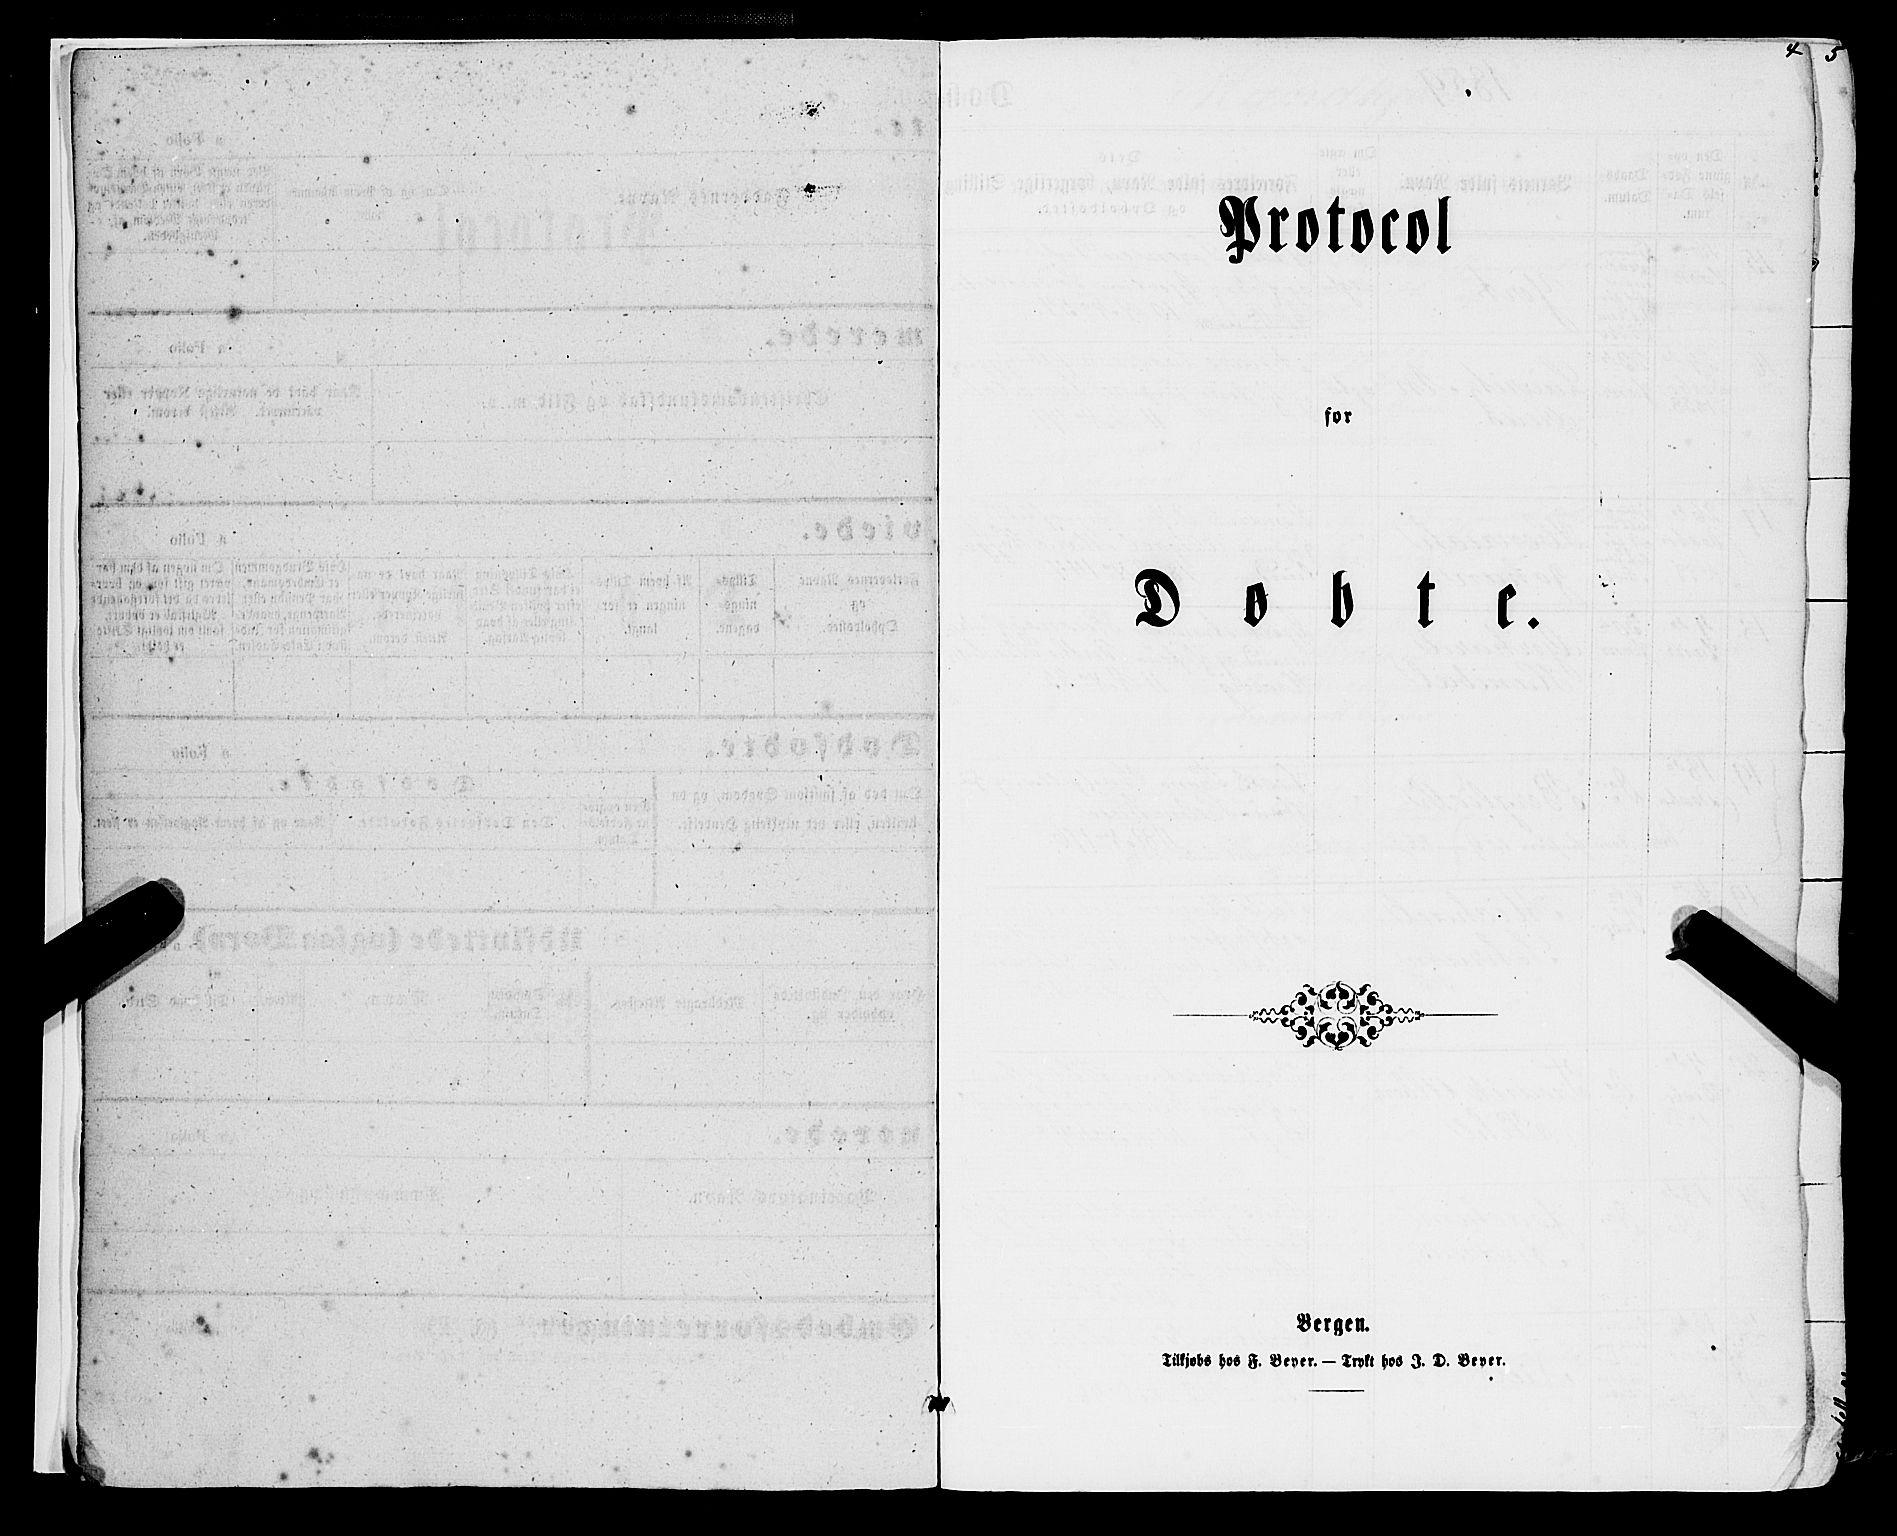 SAB, Domkirken sokneprestembete, H/Haa/L0021: Parish register (official) no. B 4, 1859-1871, p. 4